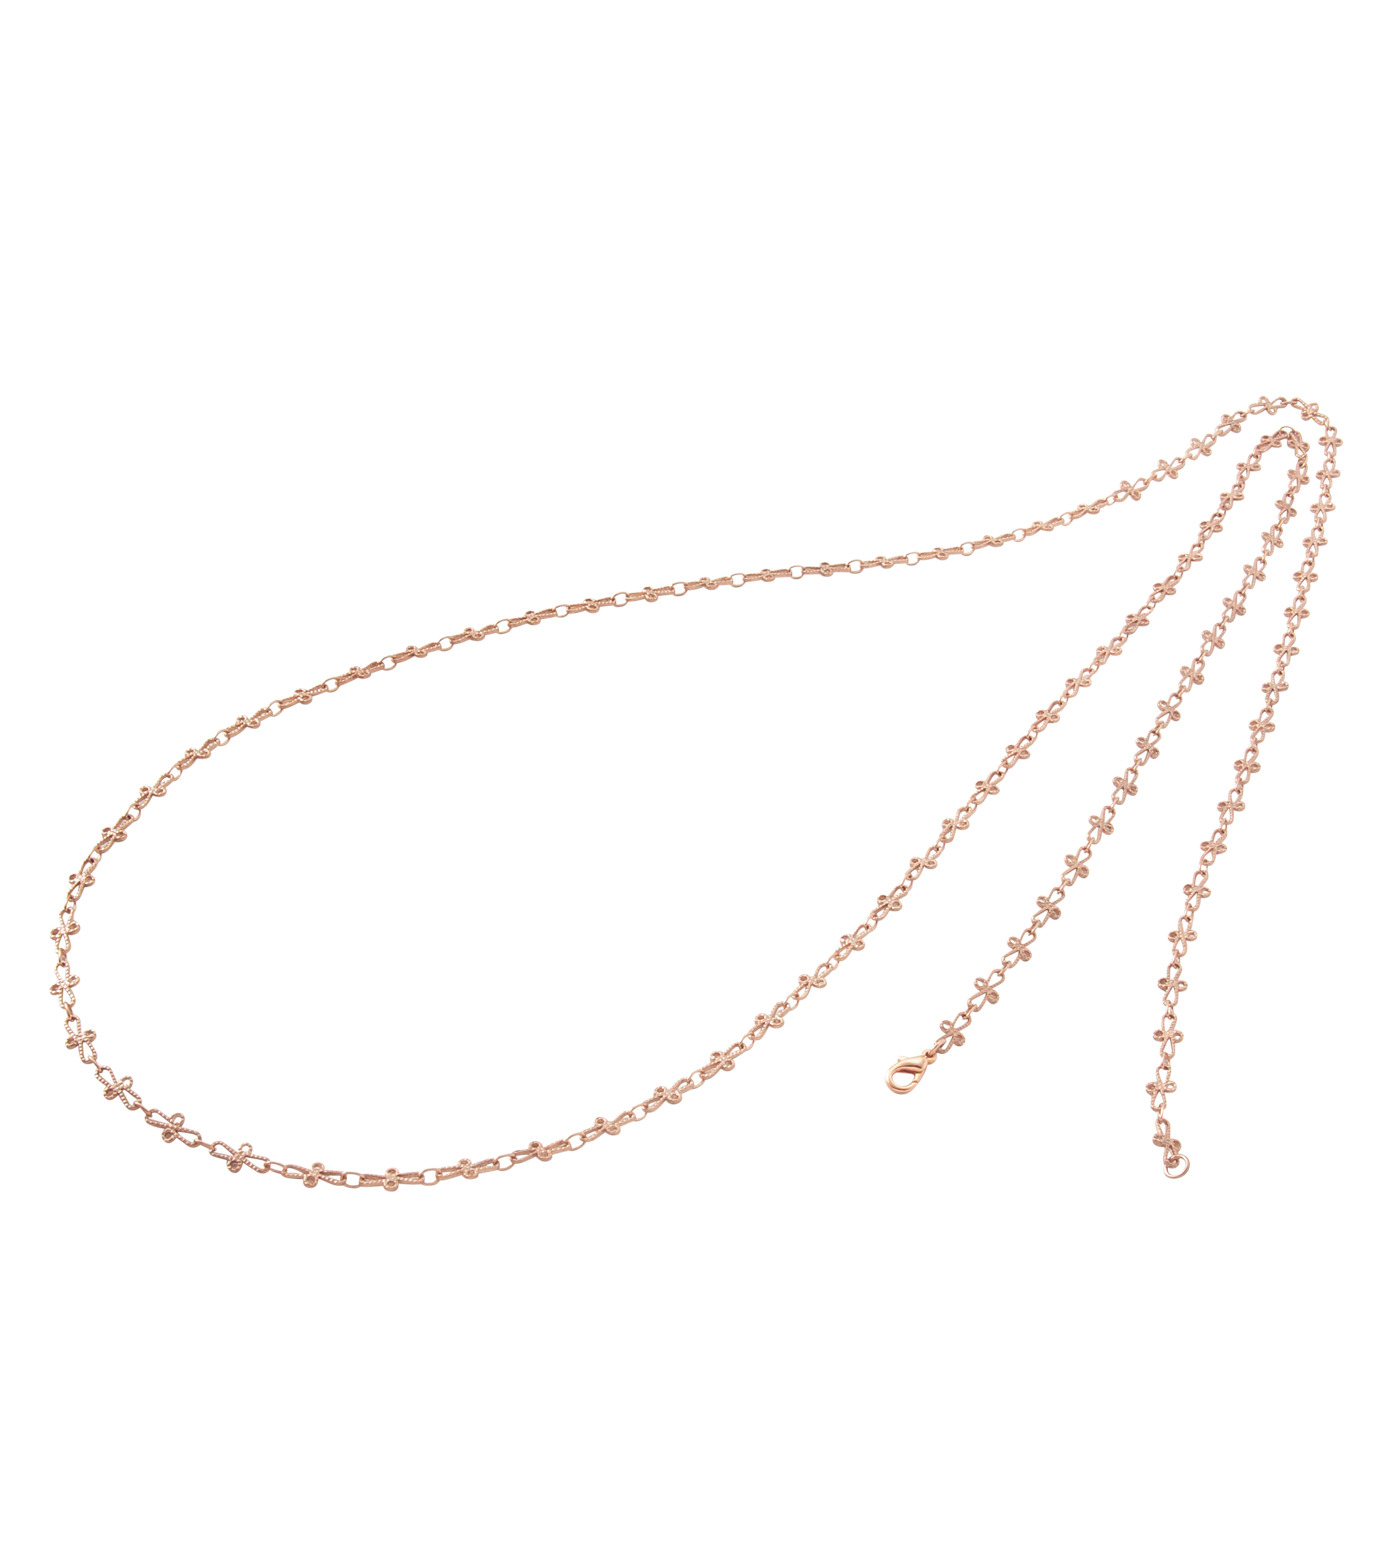 I AM by Ileana Makri(アイ アム バイ イリーナ マクリ)のTrianon Single Necklace Cross-ROSE(ネックレス/necklace)-O844-62-099-75 拡大詳細画像2